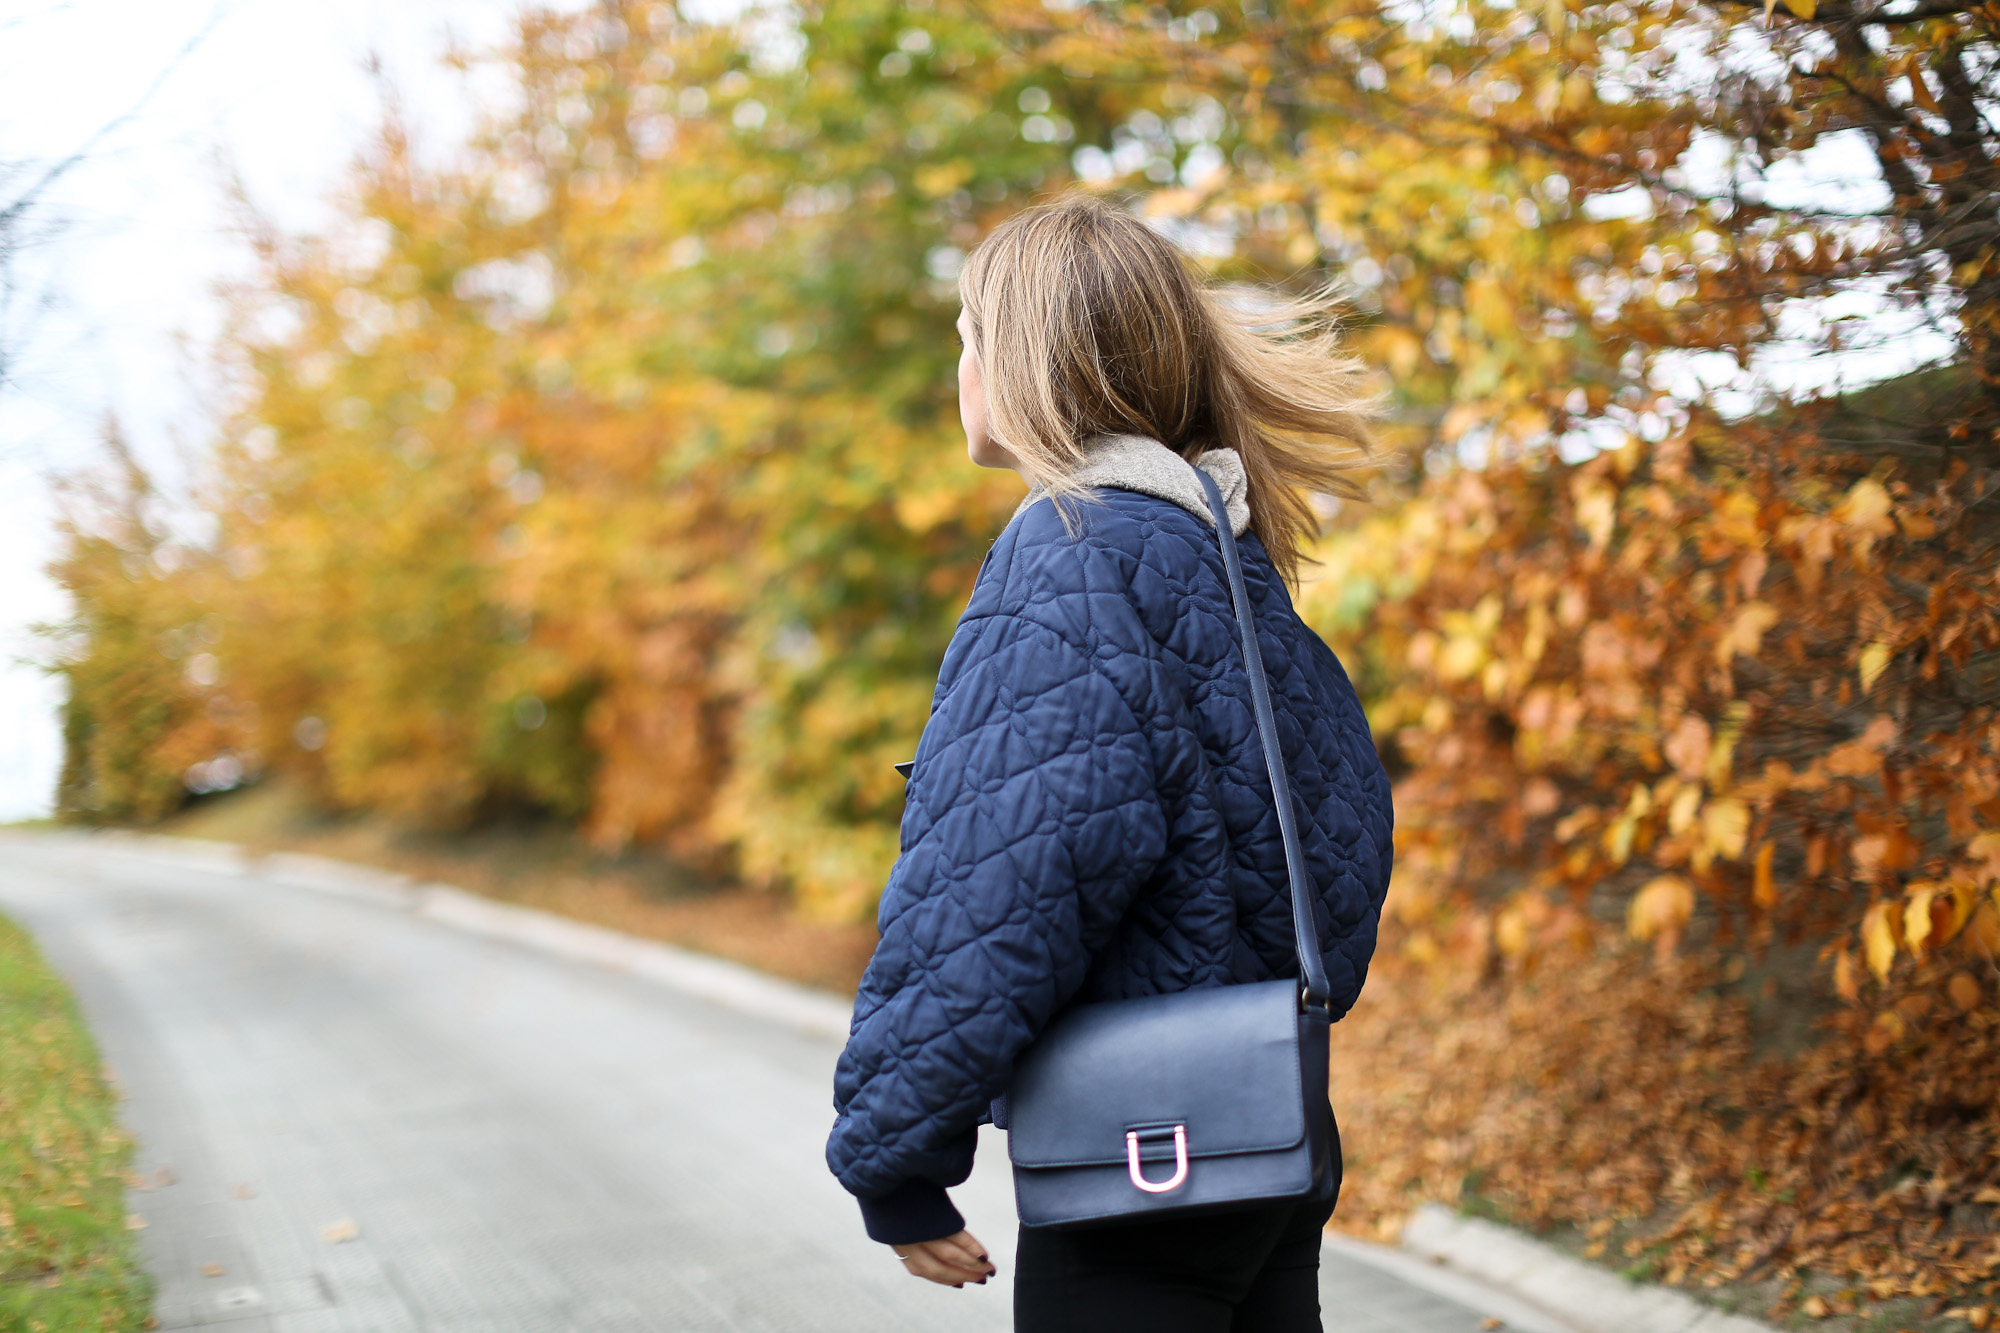 Clochet_streetstyle_stefanel_bomber_jacket_mango_suede_pumps-13